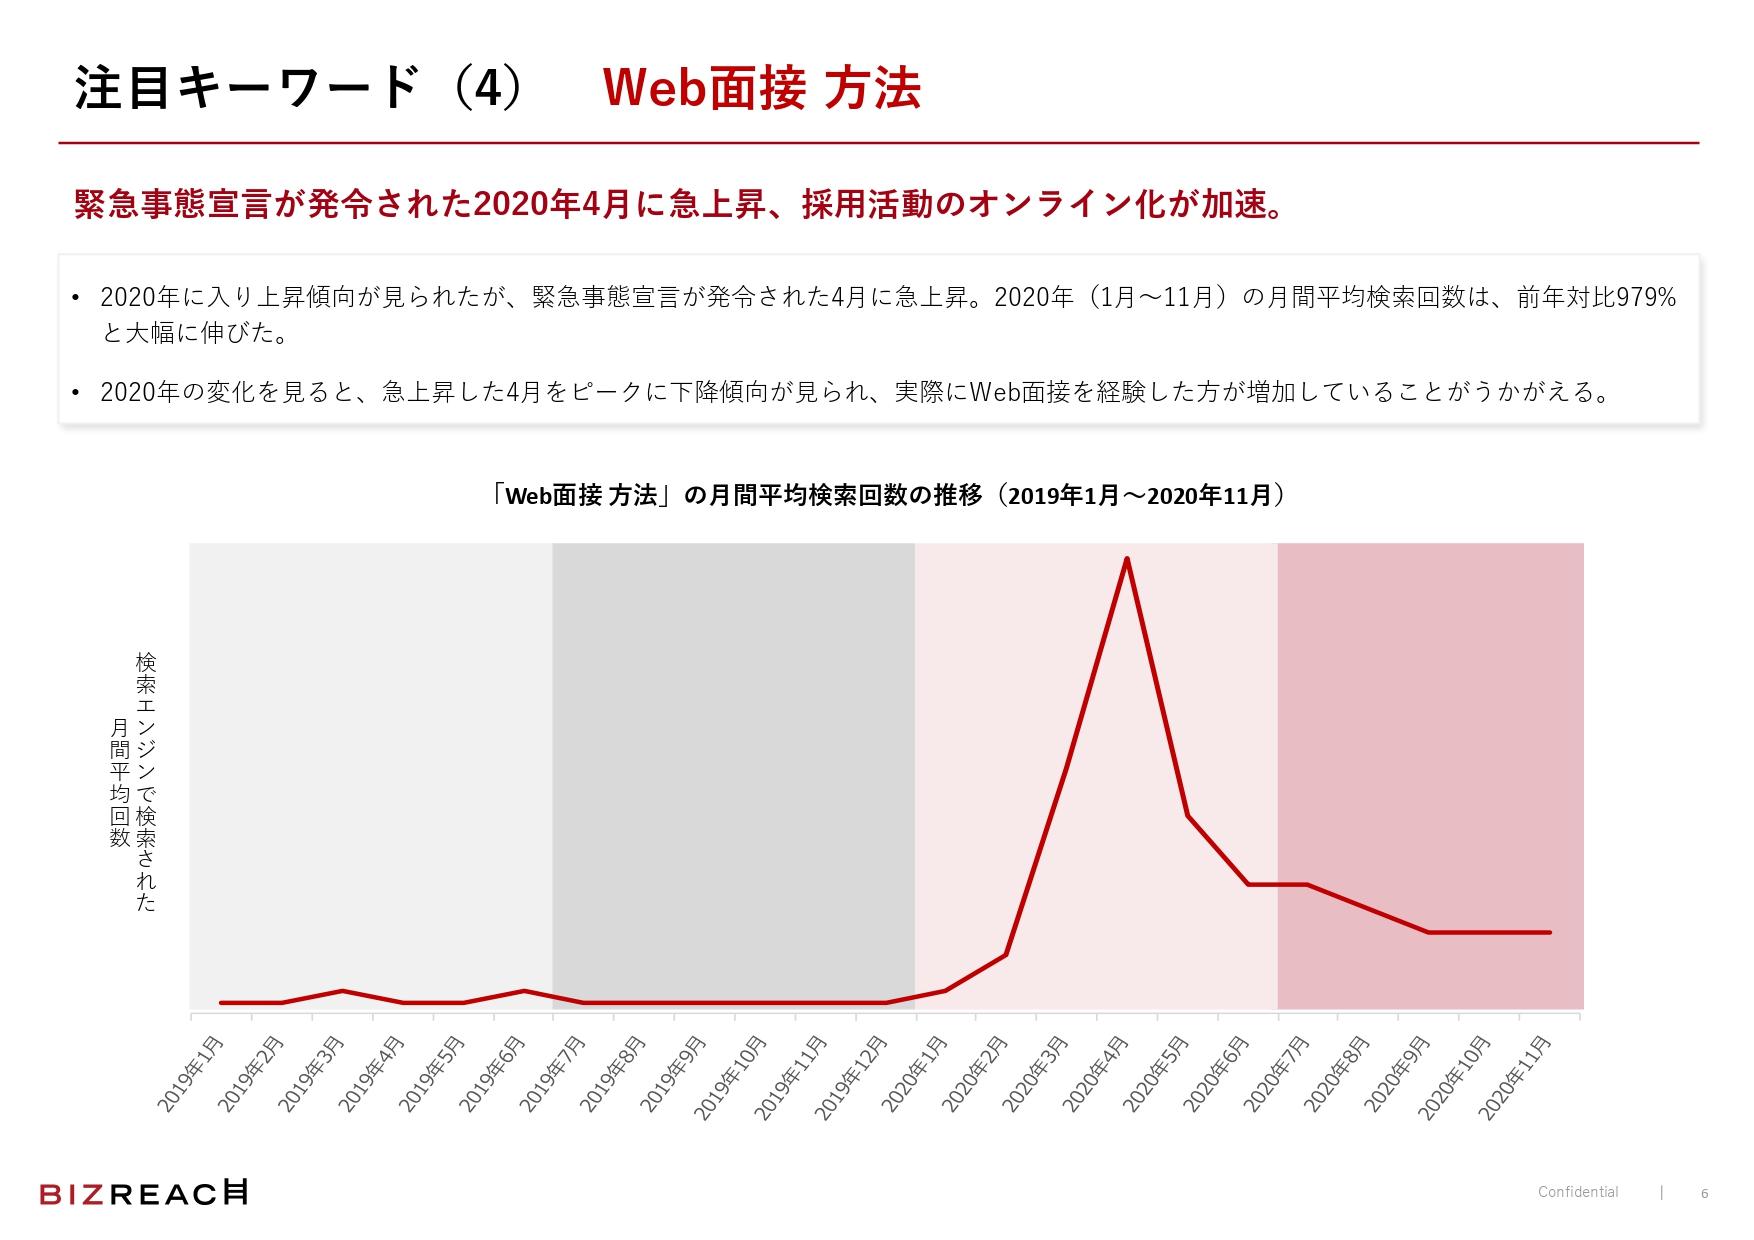 「Web面接 方法」の月間平均検索回数は、前年対比で979%